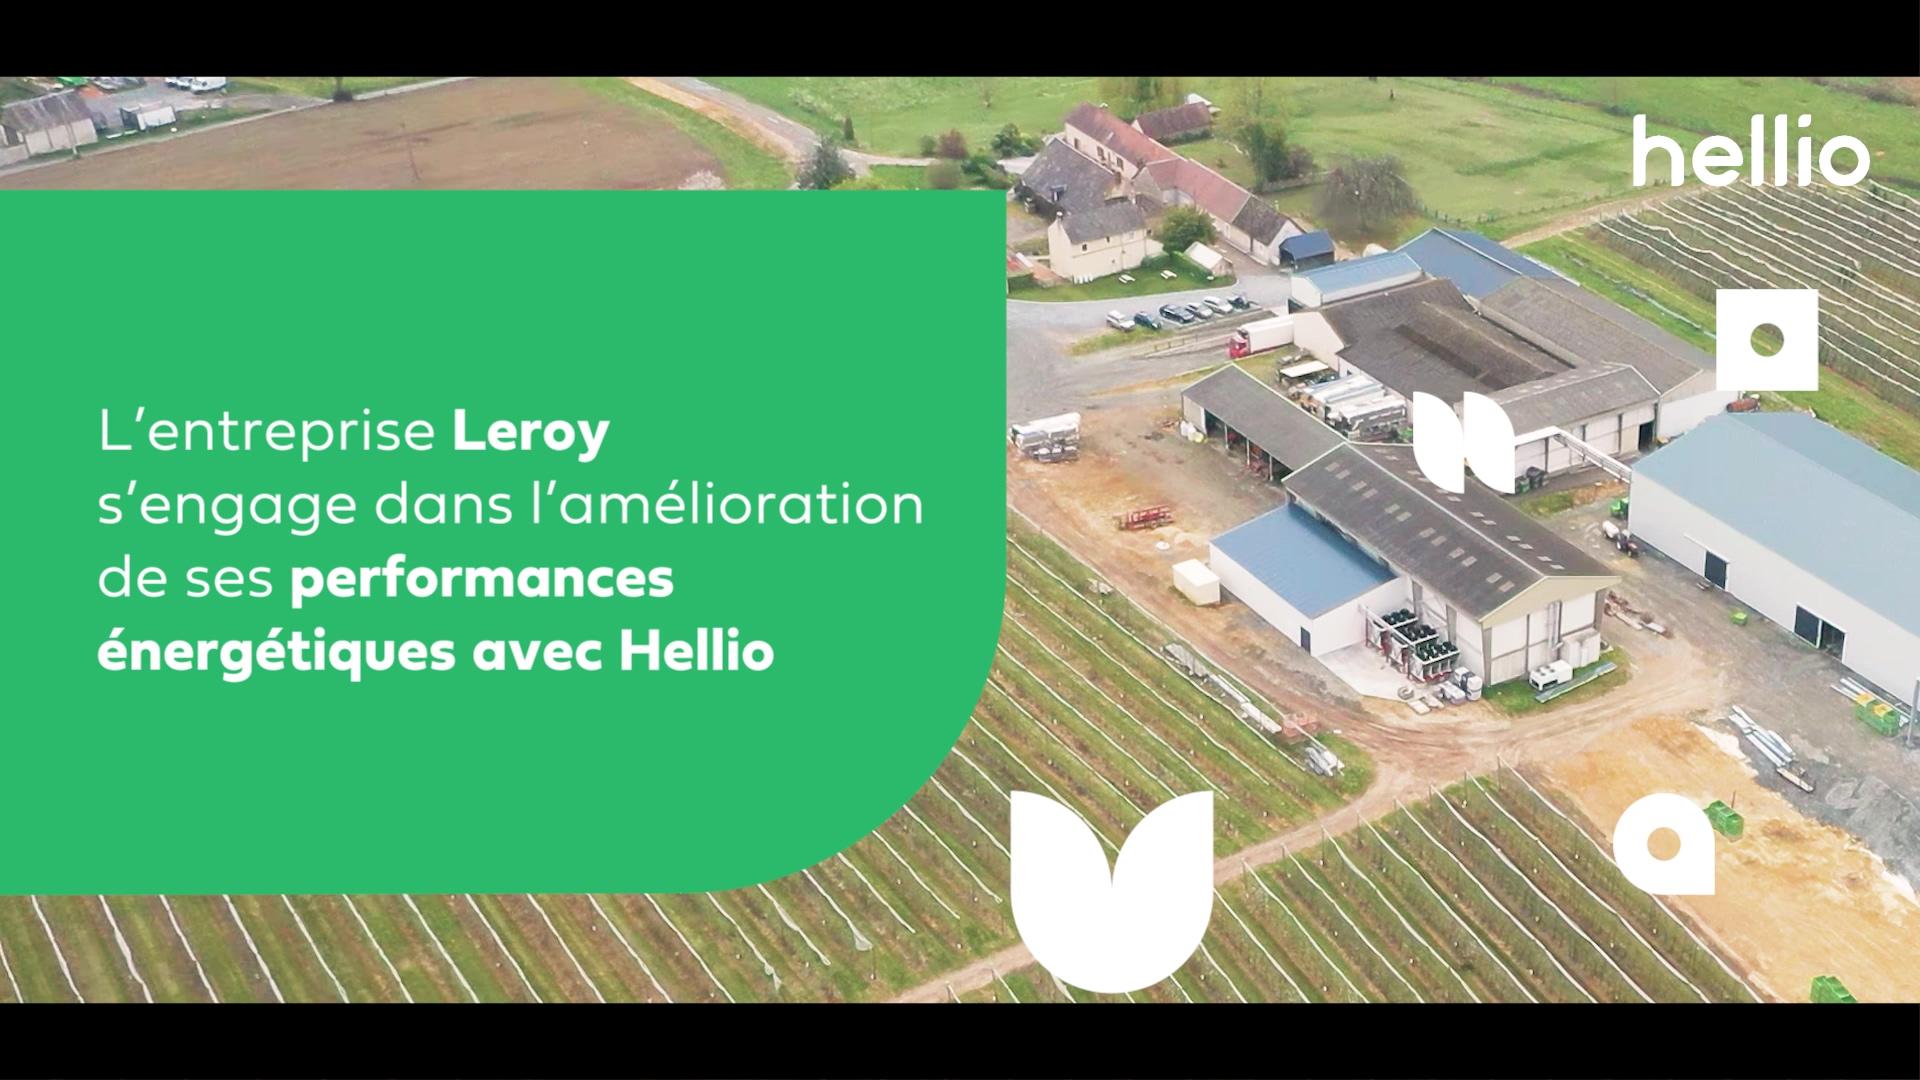 [Grand Comptes]vidéo-SARL Leroy-solution agriculture0-Hellio - GEO PLC